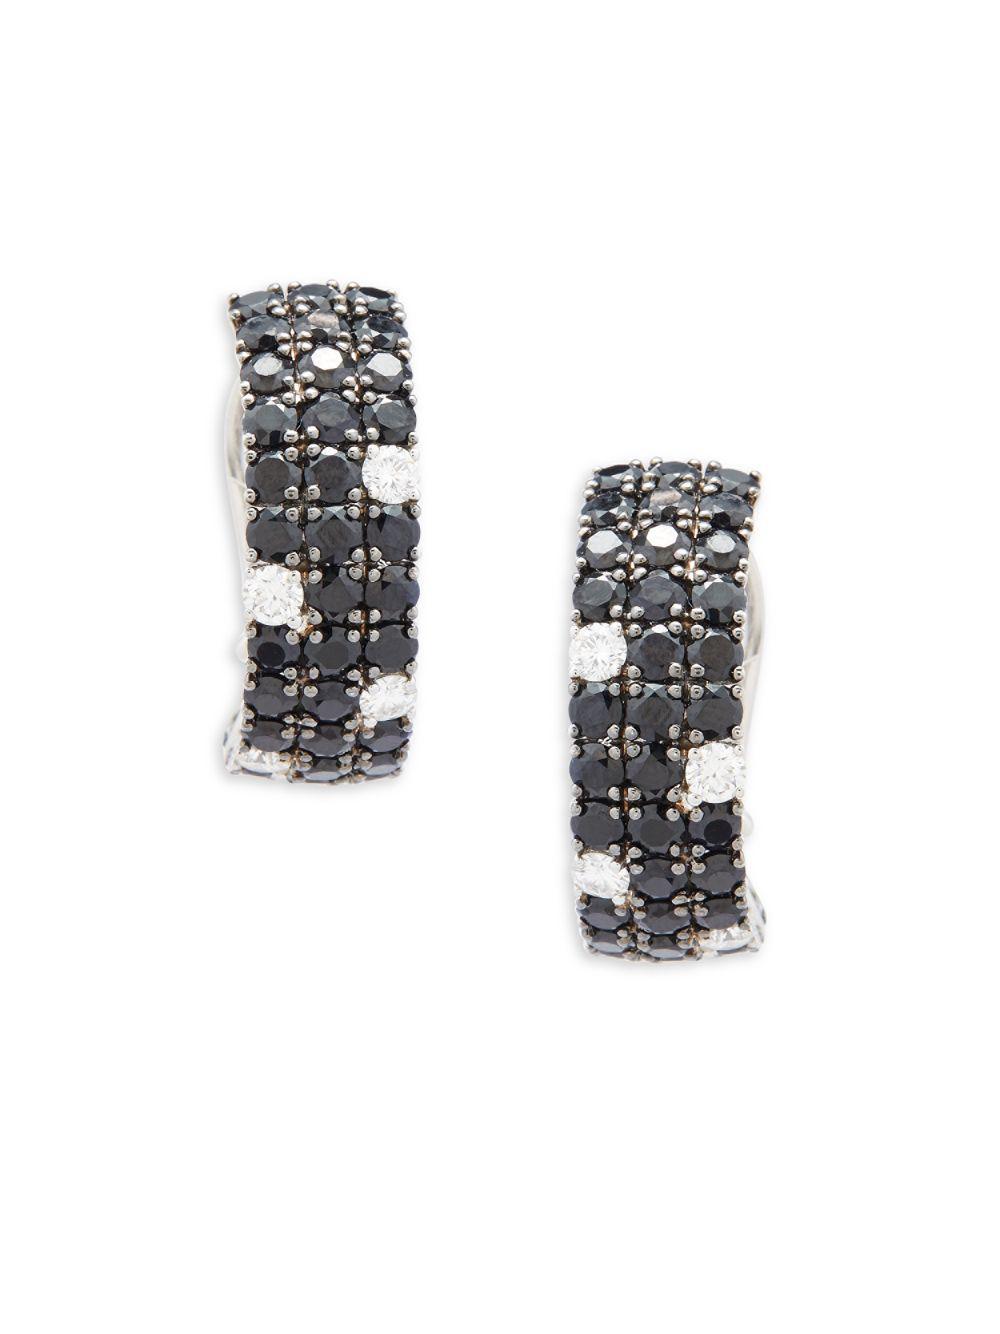 Roberto Coin 18k Meteorite Diamond & Sapphire Stud Earrings YCpU8Qmf5q